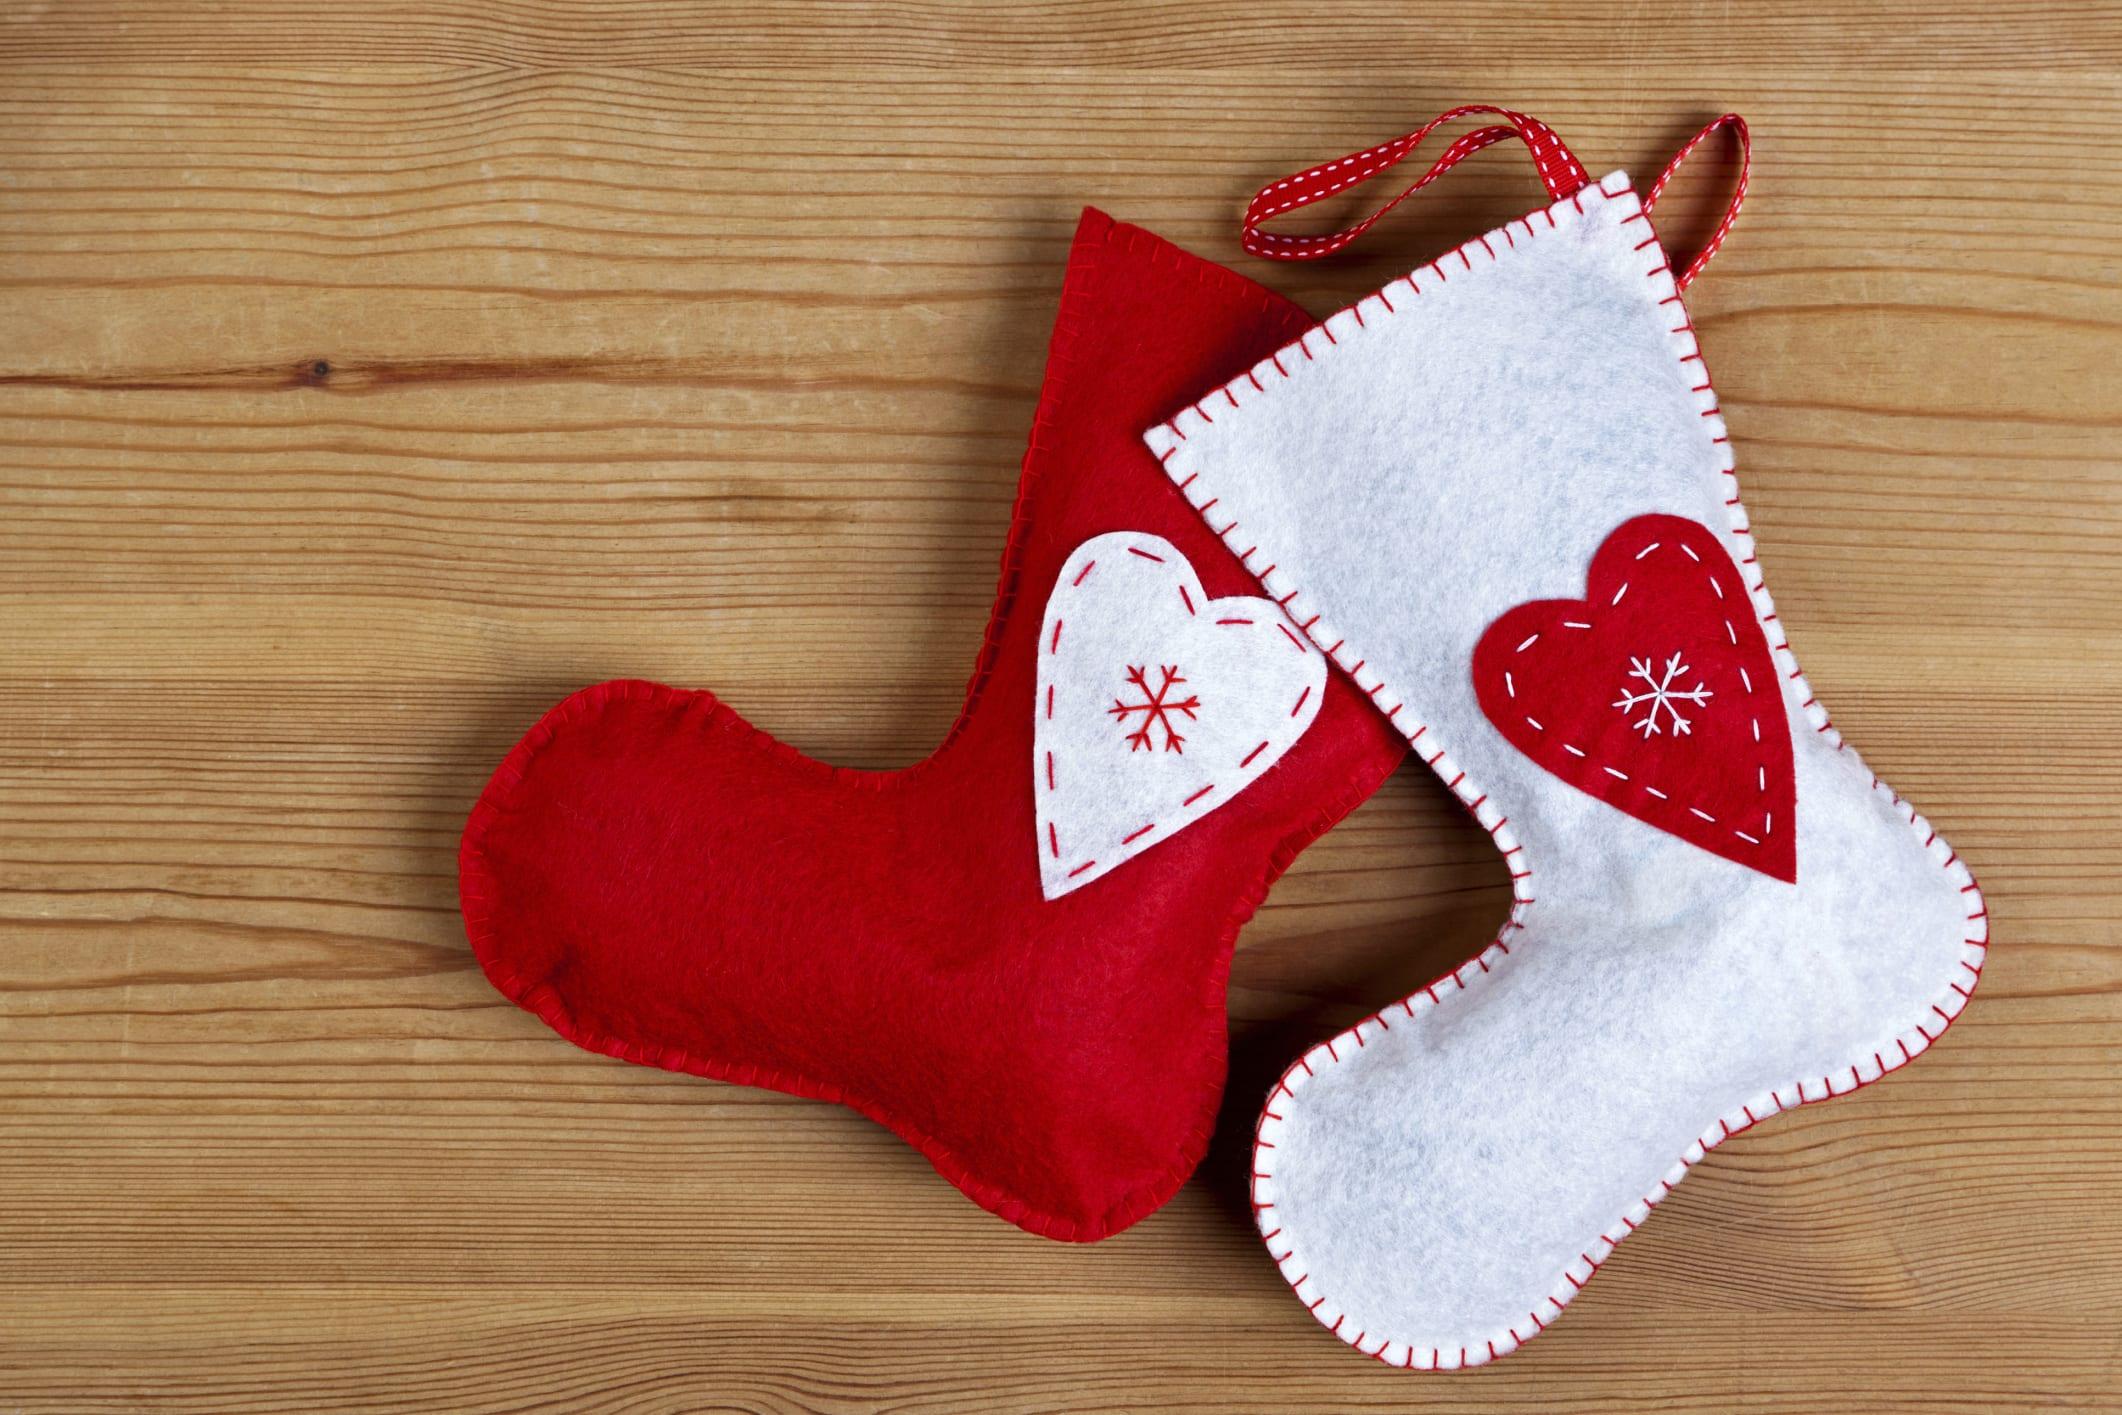 Manualidades de navidad para ni os - Manualidades de ganchillo para navidad ...